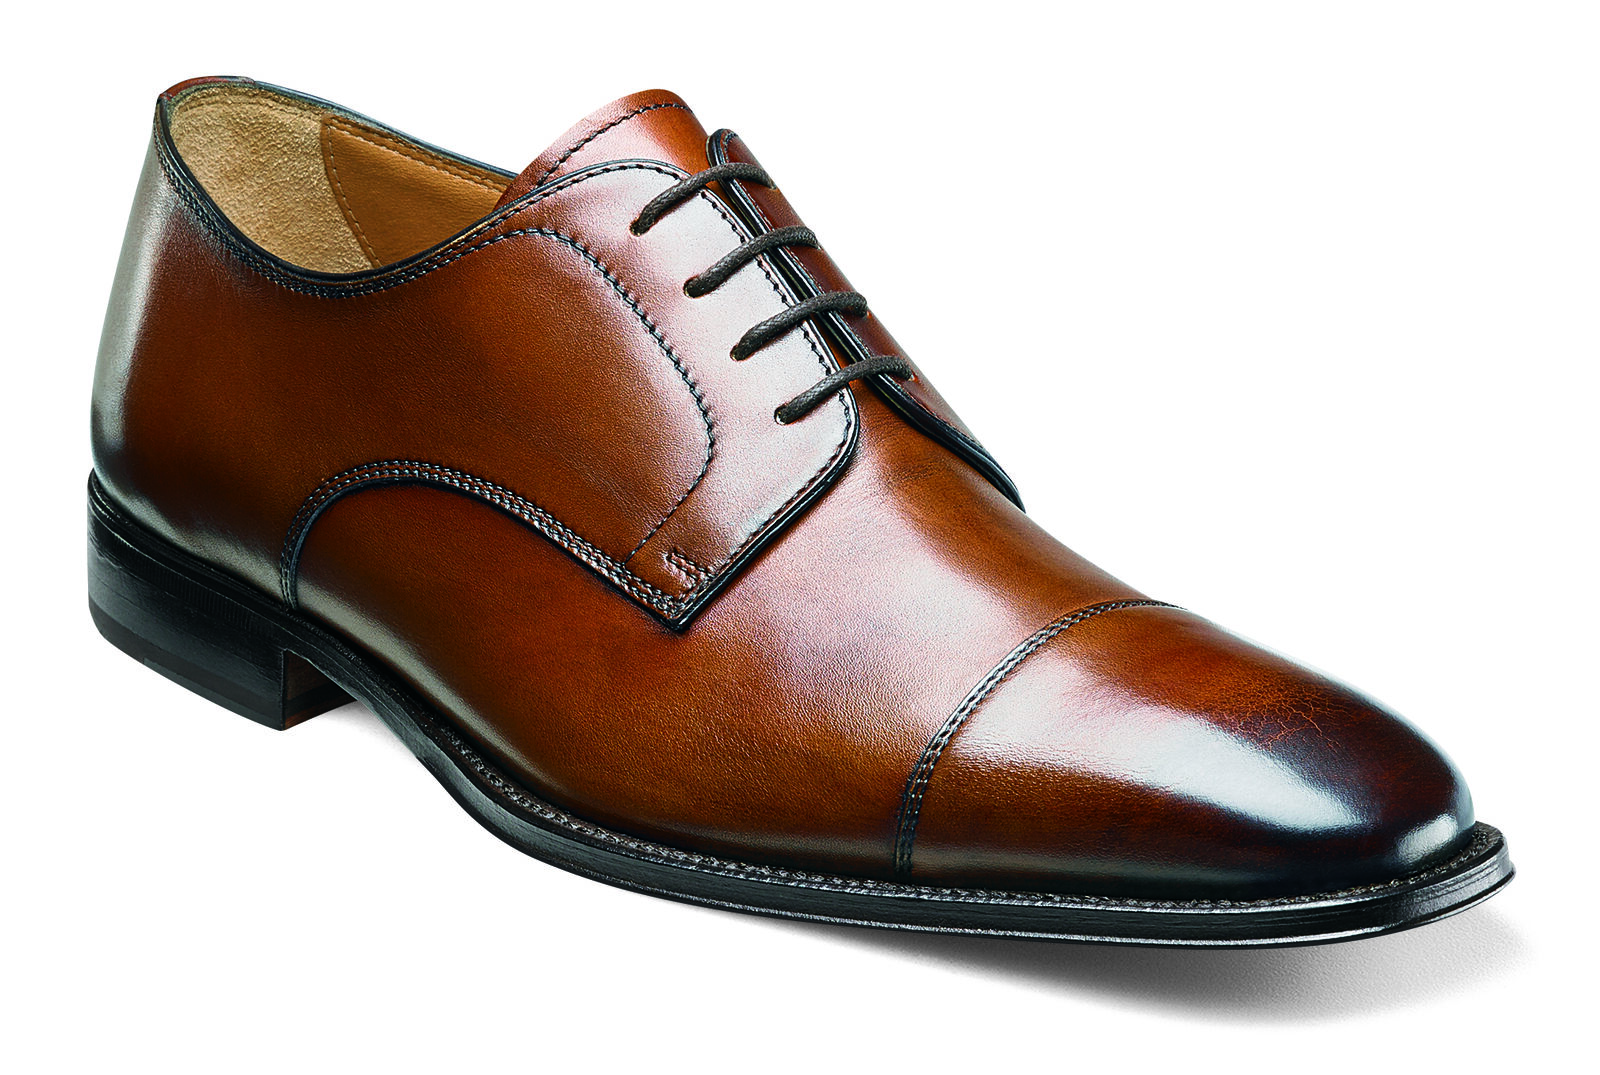 Florsheim Classico Mens Cognac Leather Lace Up Cap Toe Oxford Oxford Toe Dress Work schuhe 1b256b